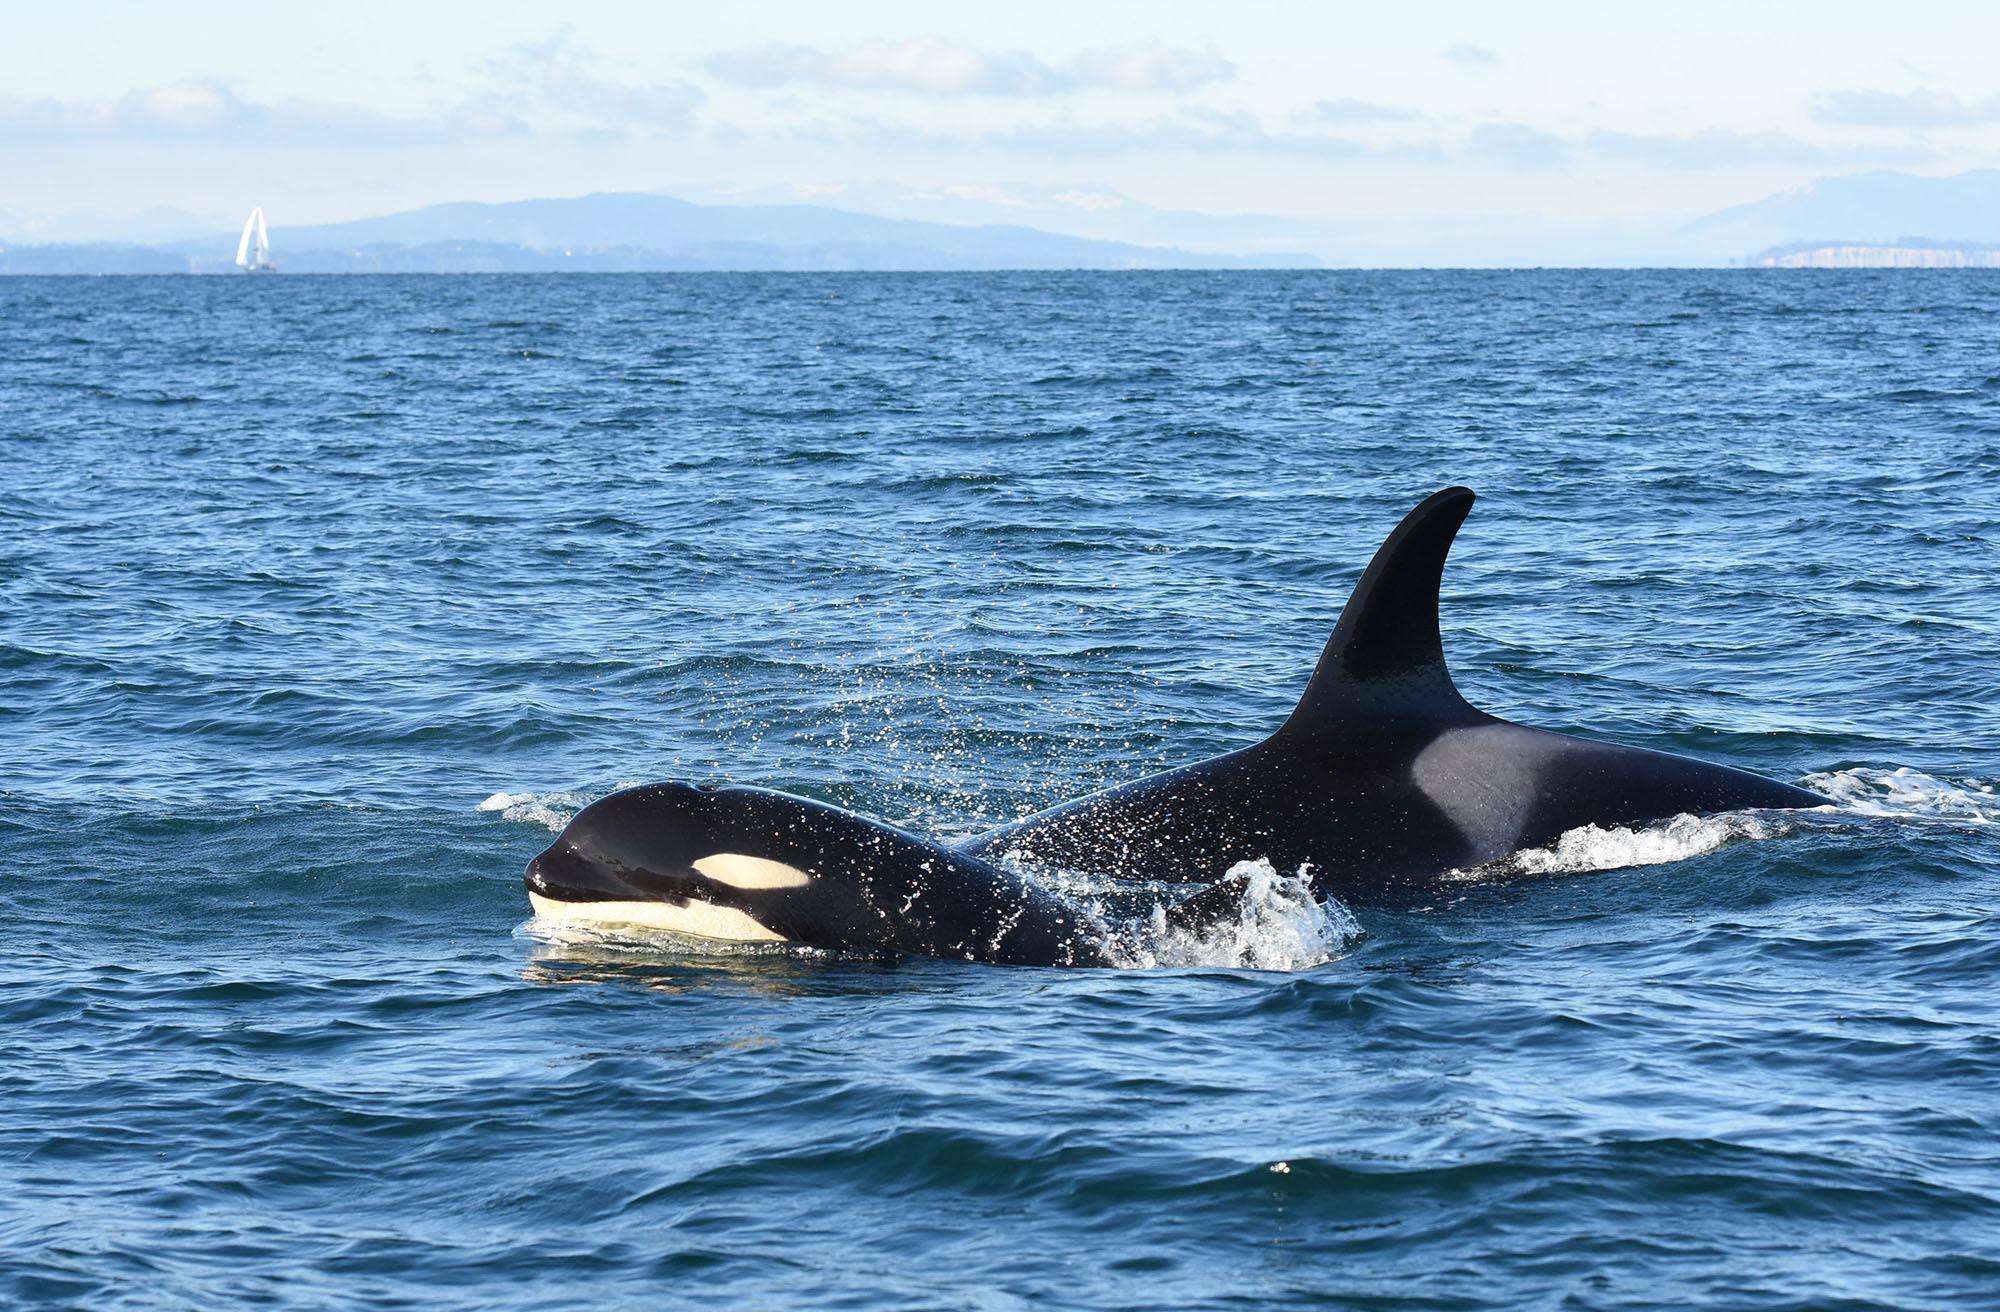 Orca calf Nova (J51). Photo by Naturalist/Capt Heather MacIntyre, Maya's Legacy Whale Watching, Friday Harbor, WA.